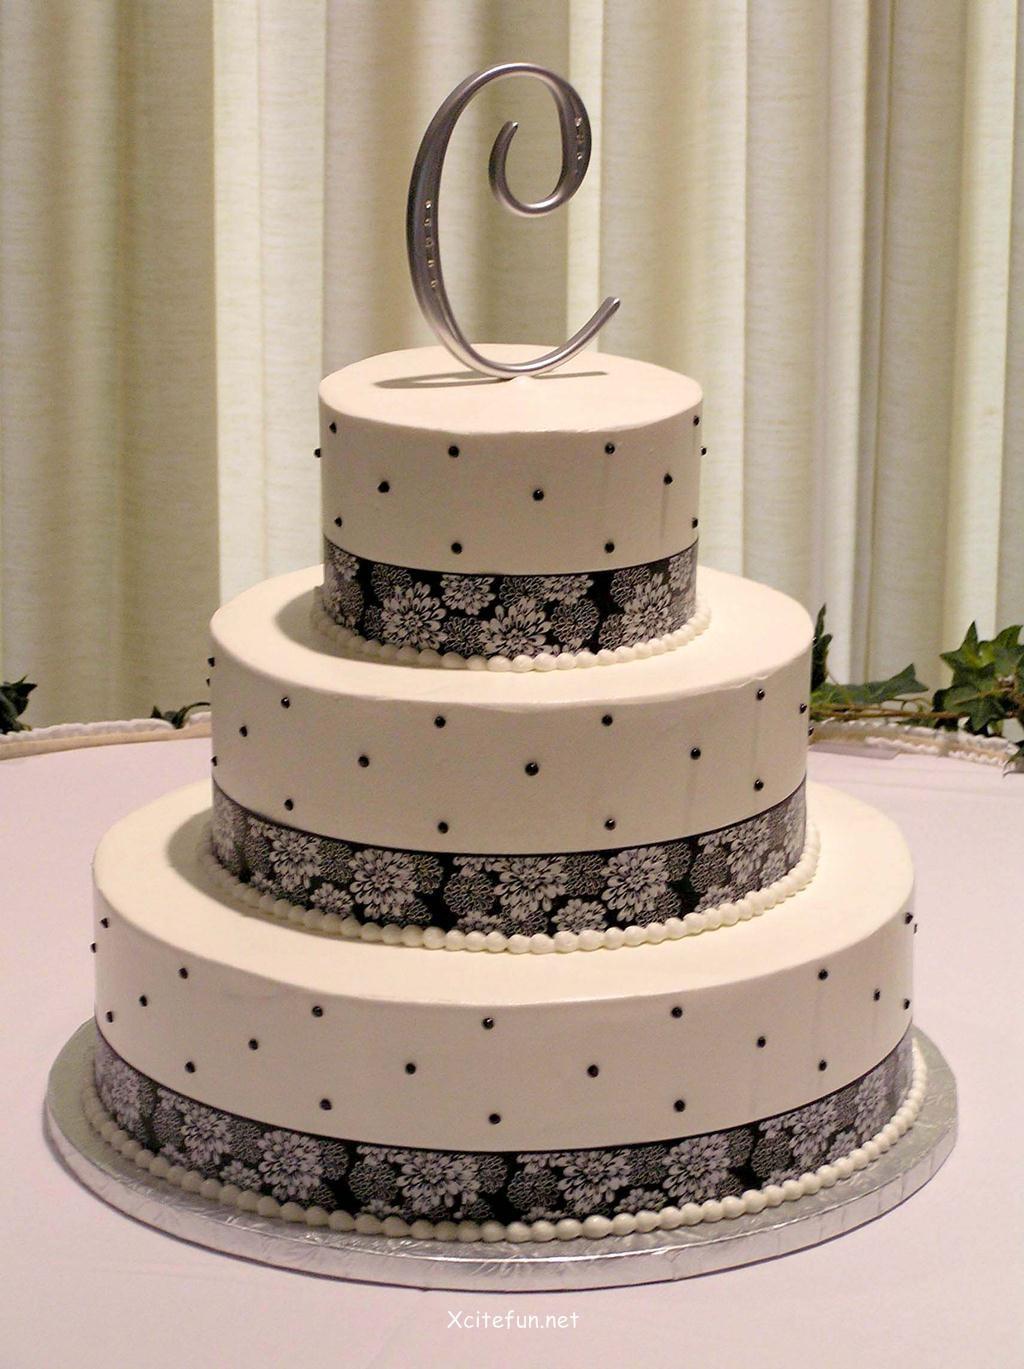 Wedding Cakes Decorations Ideas  Wedding Cakes Decorating Ideas XciteFun